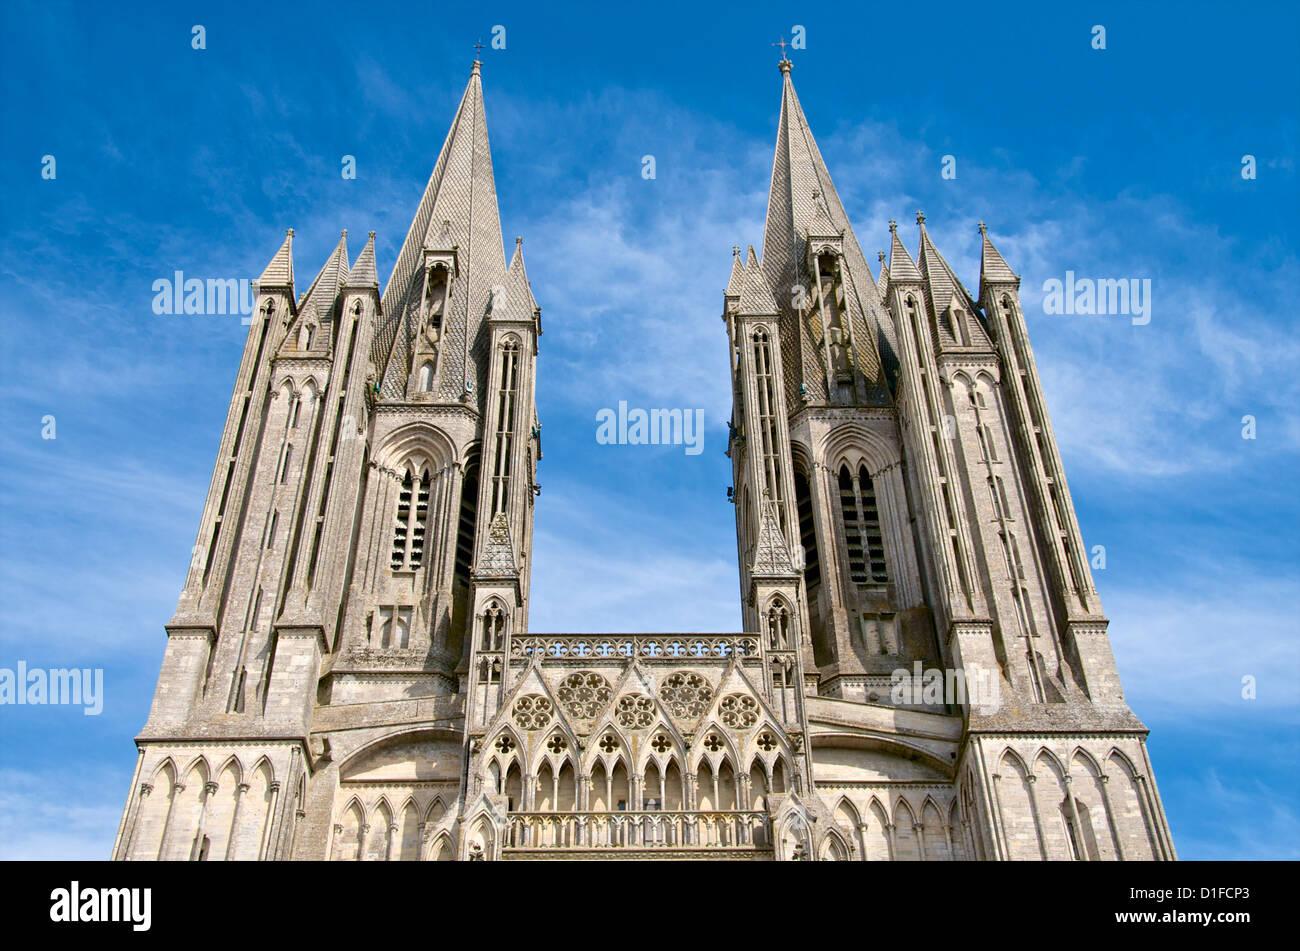 Detalle de la catedral de Notre Dame que datan del siglo XIV, Coutances, Cotentin, Normandía, Francia, Europa Foto de stock